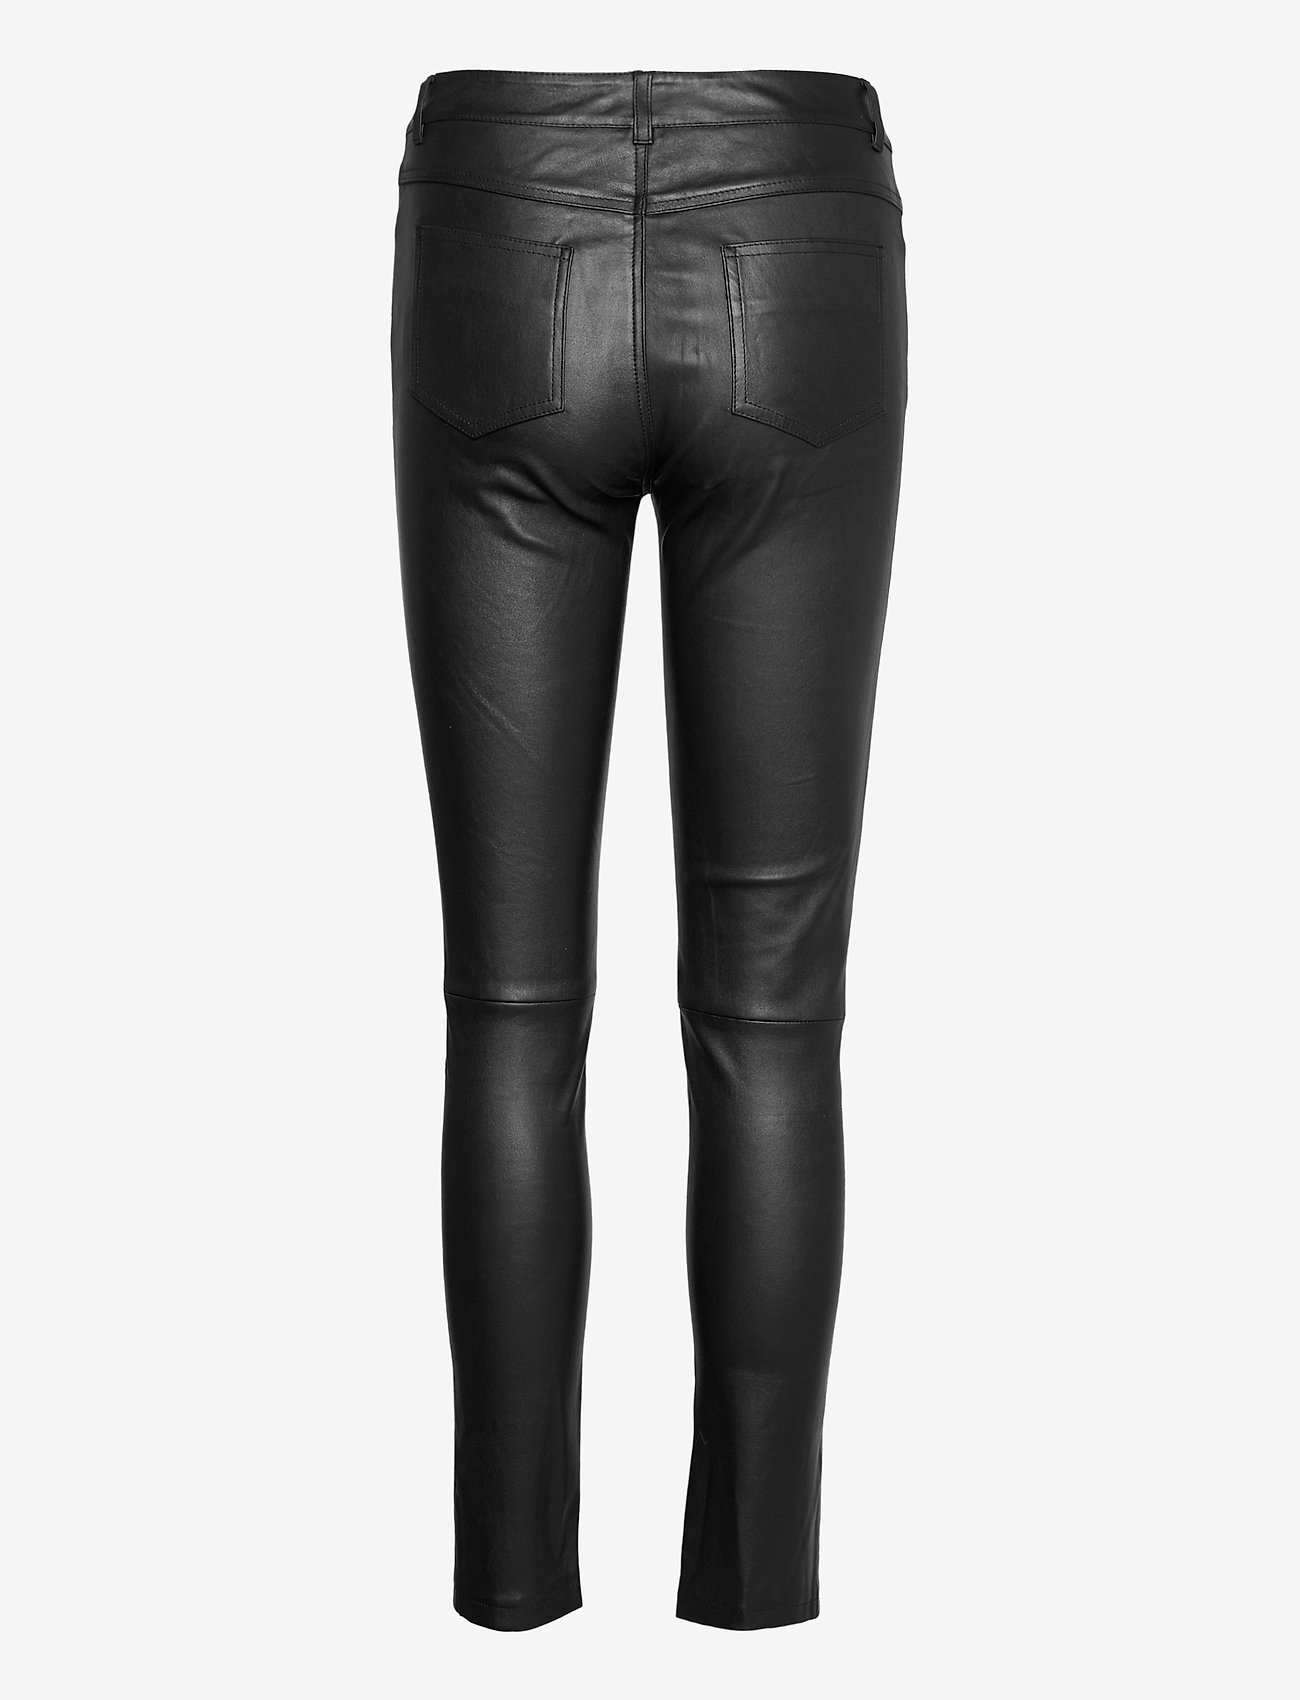 Stand Studio - Stella Jeans II - læderbukser - black - 1